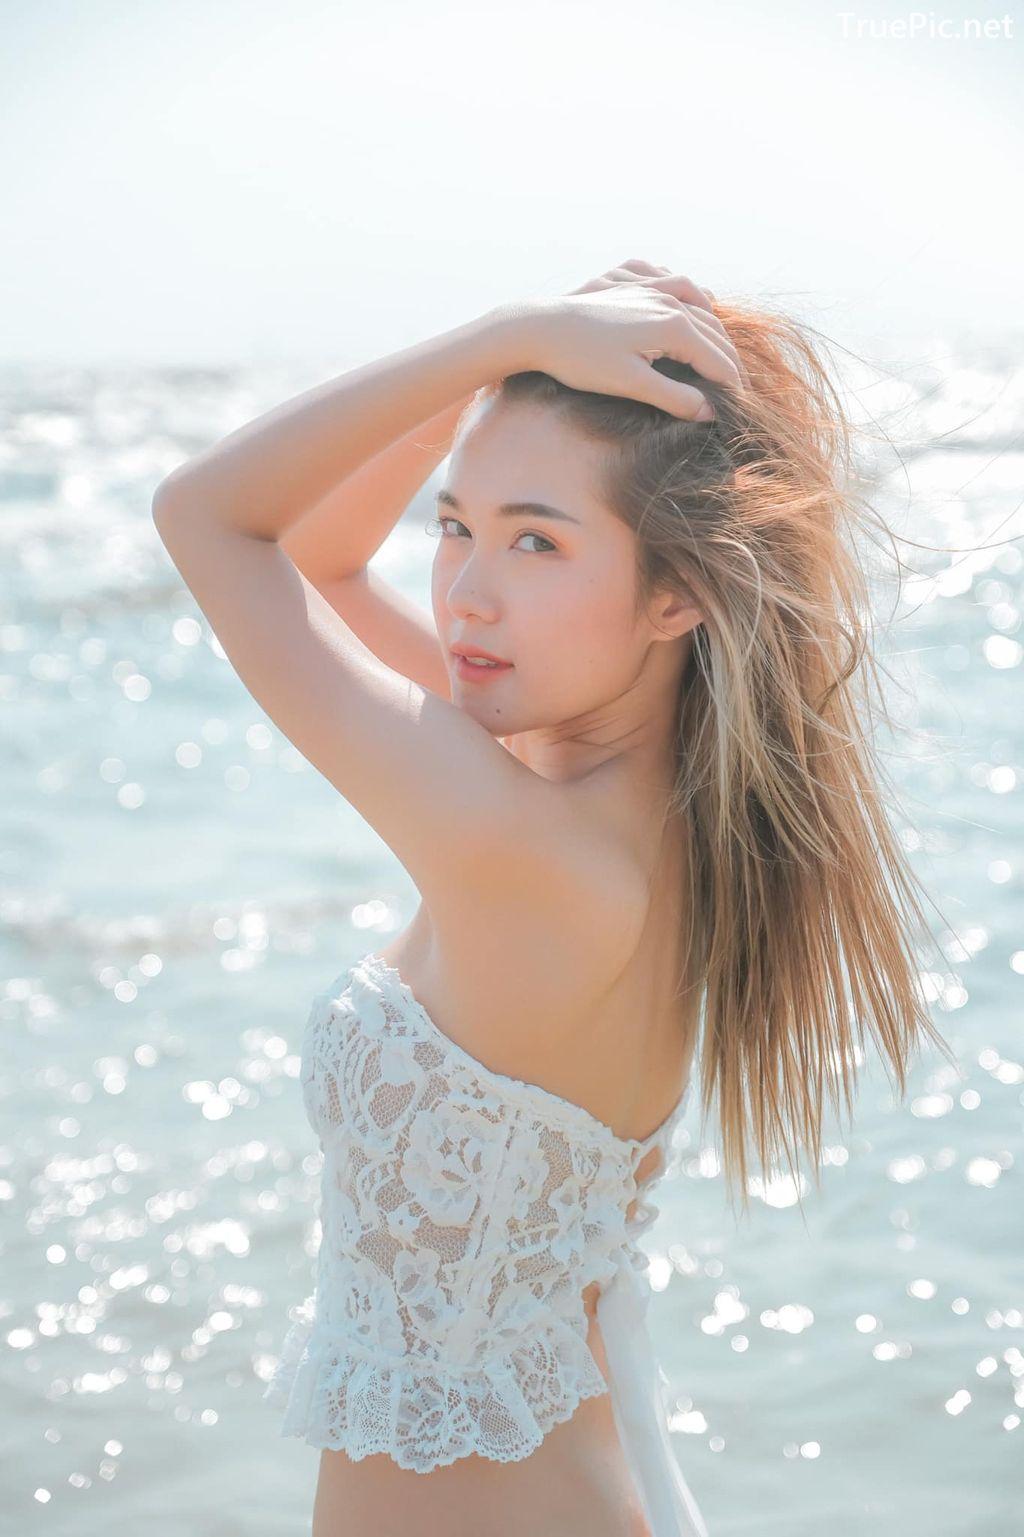 Image-Thailand-Model-Pitcha-Srisattabuth-White-Lace-Bikini-TruePic.net- Picture-1